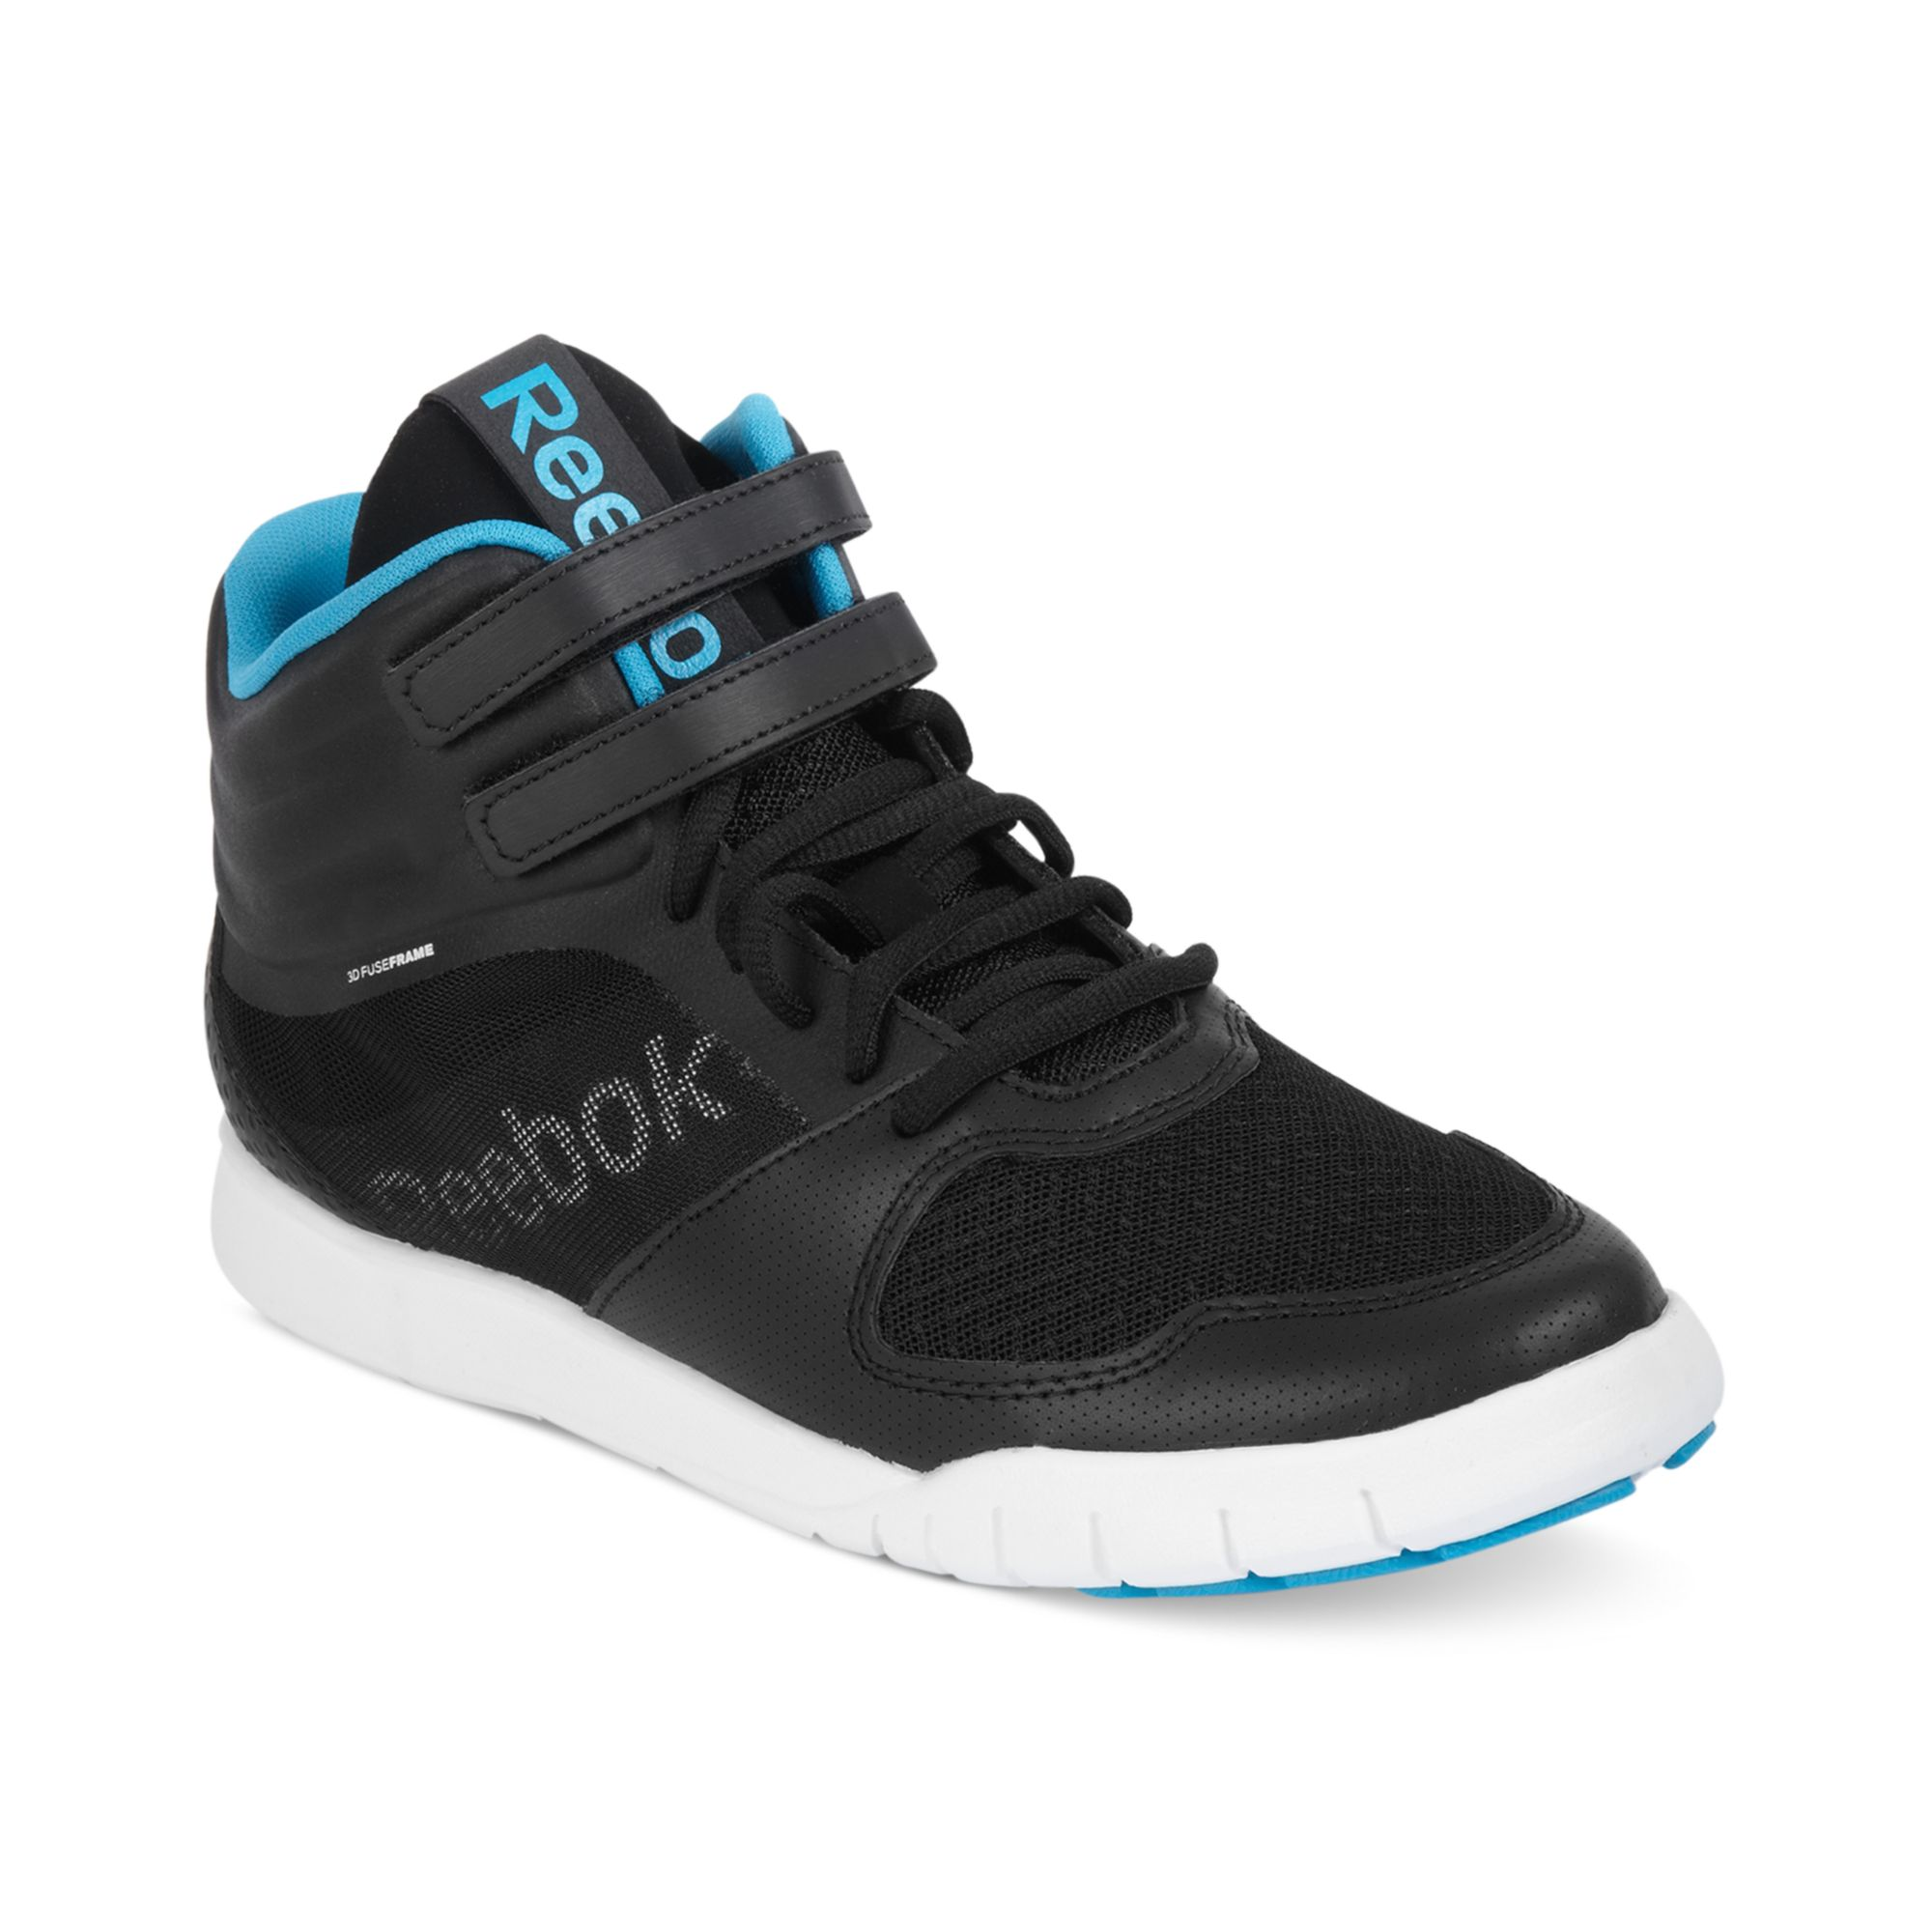 3f59f68edab Lyst - Reebok Dance Urlead Mid Sneakers in Blue